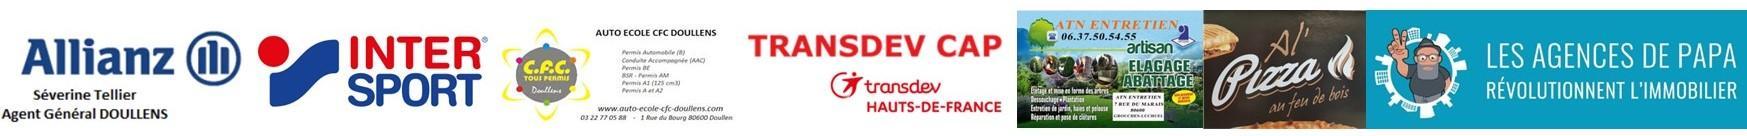 Banderole sponsors 2021